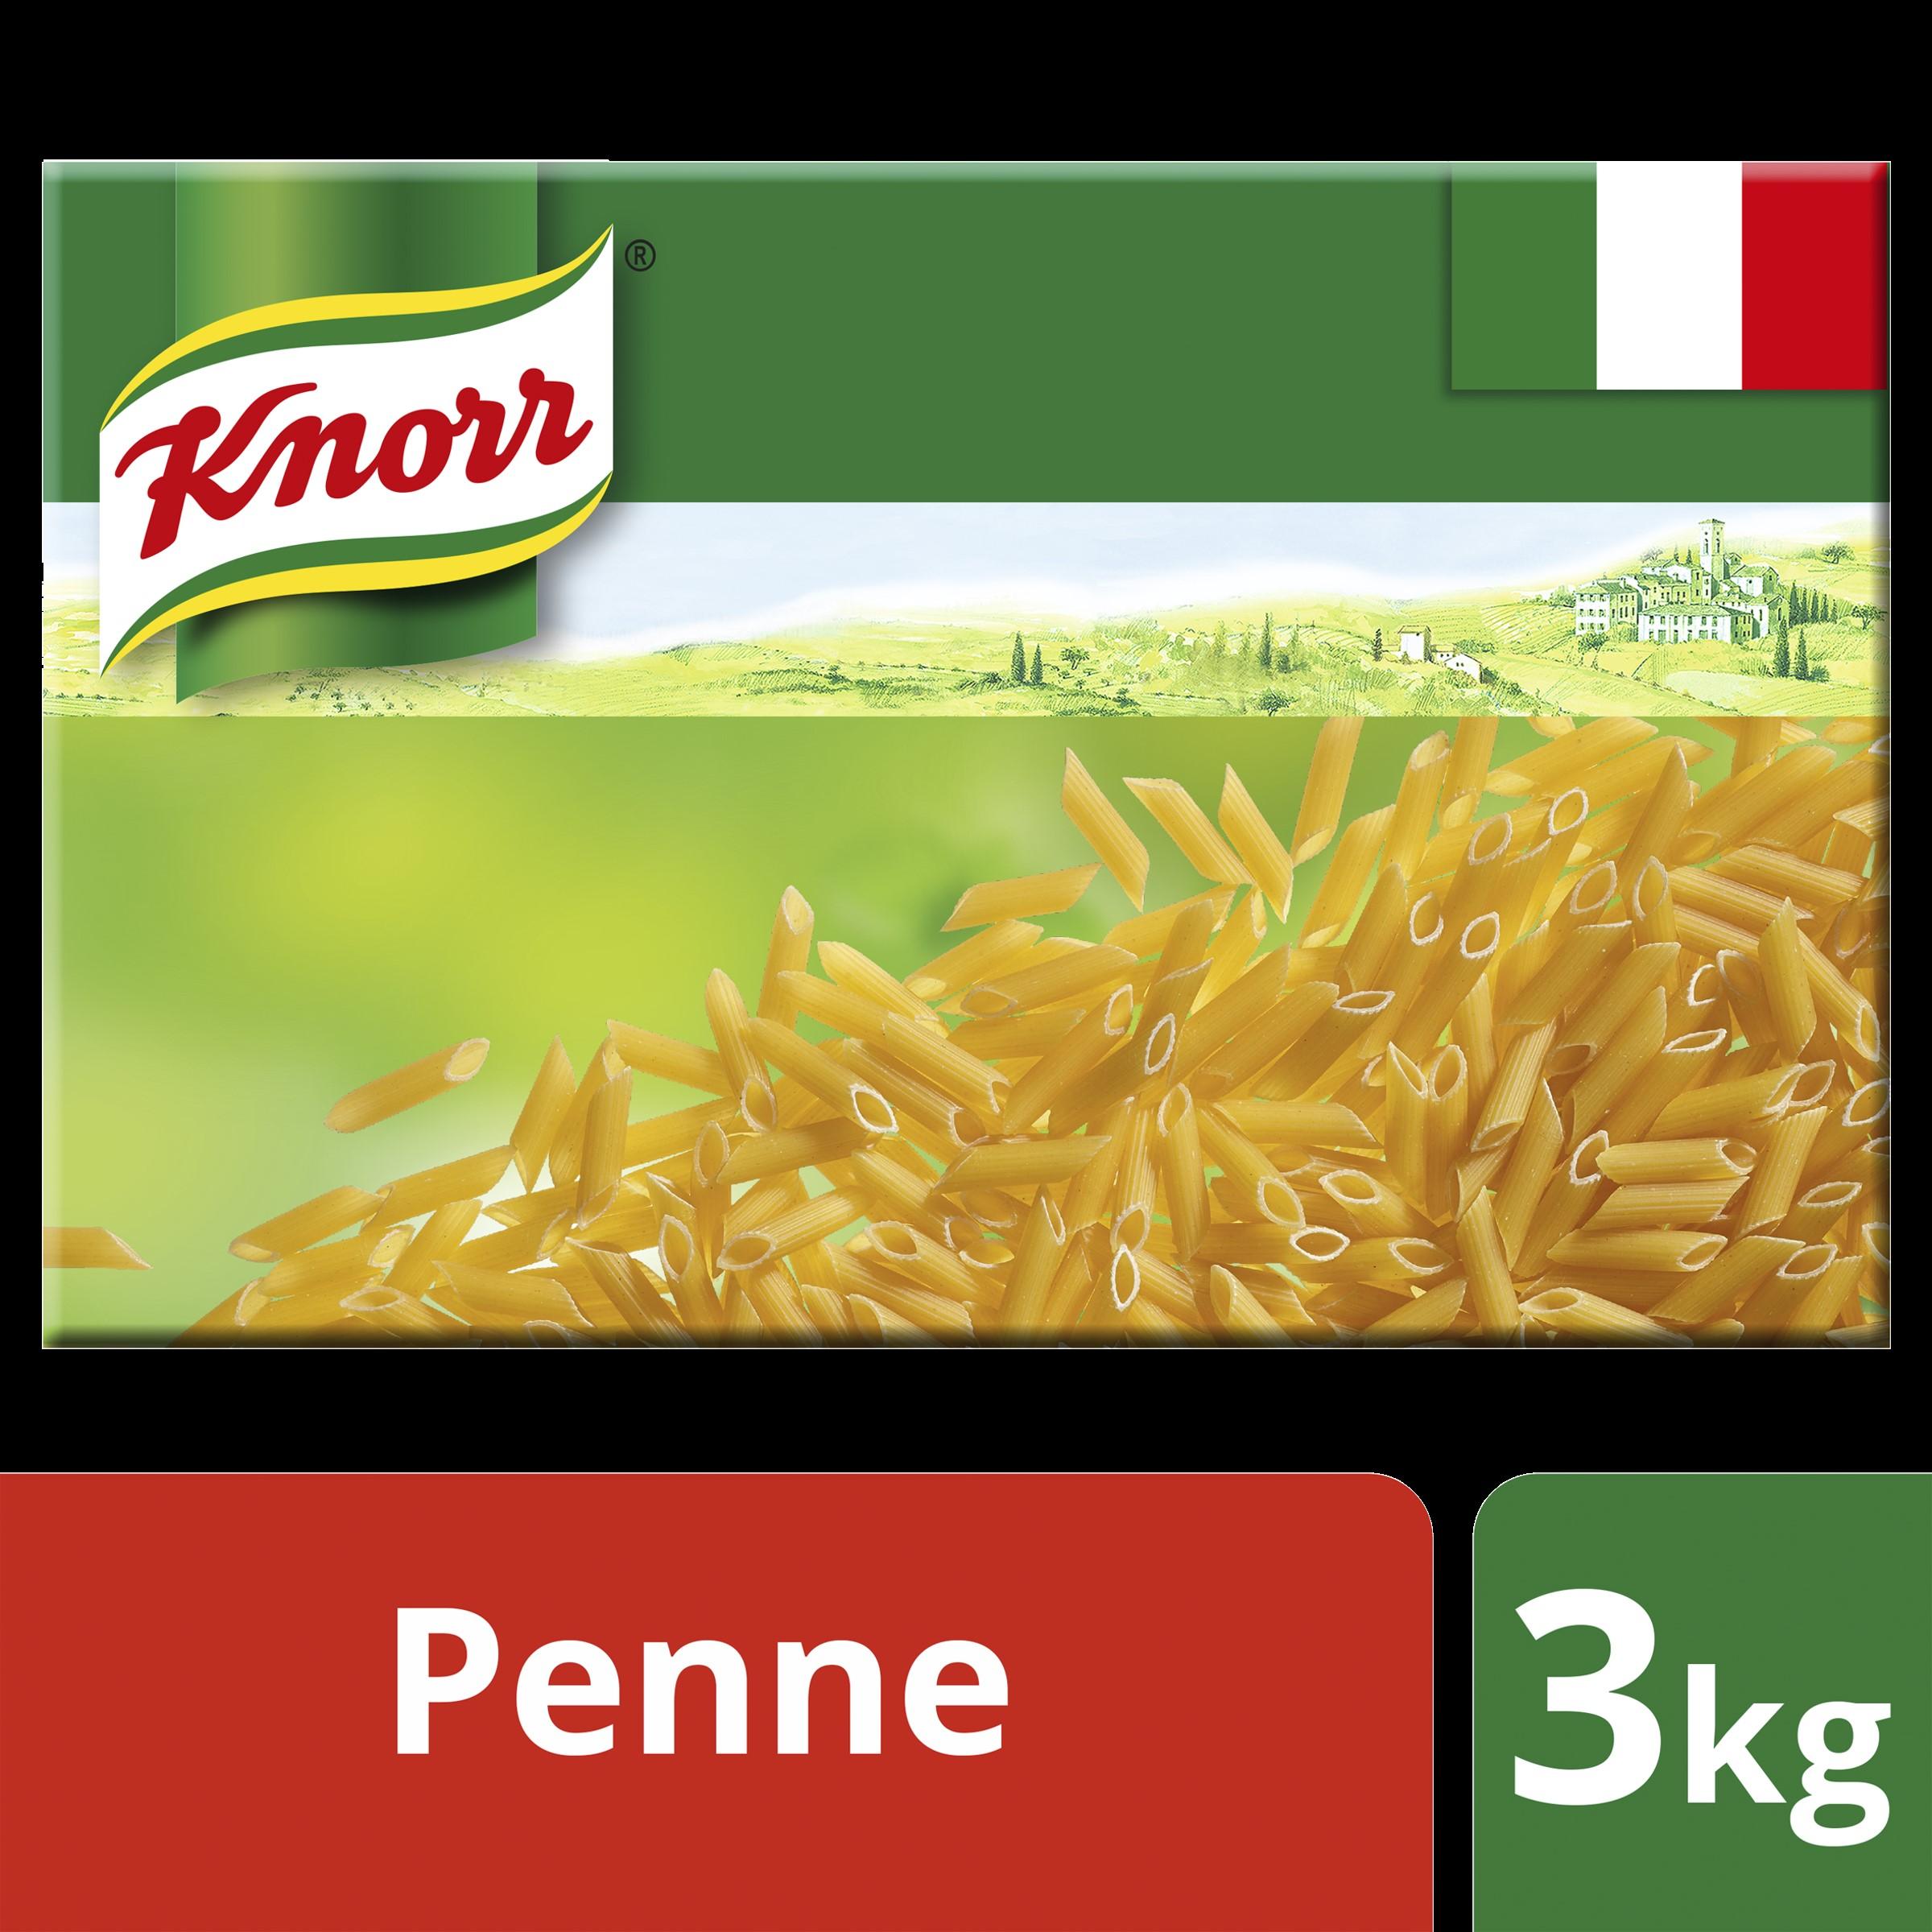 Knorr Penne 3kg